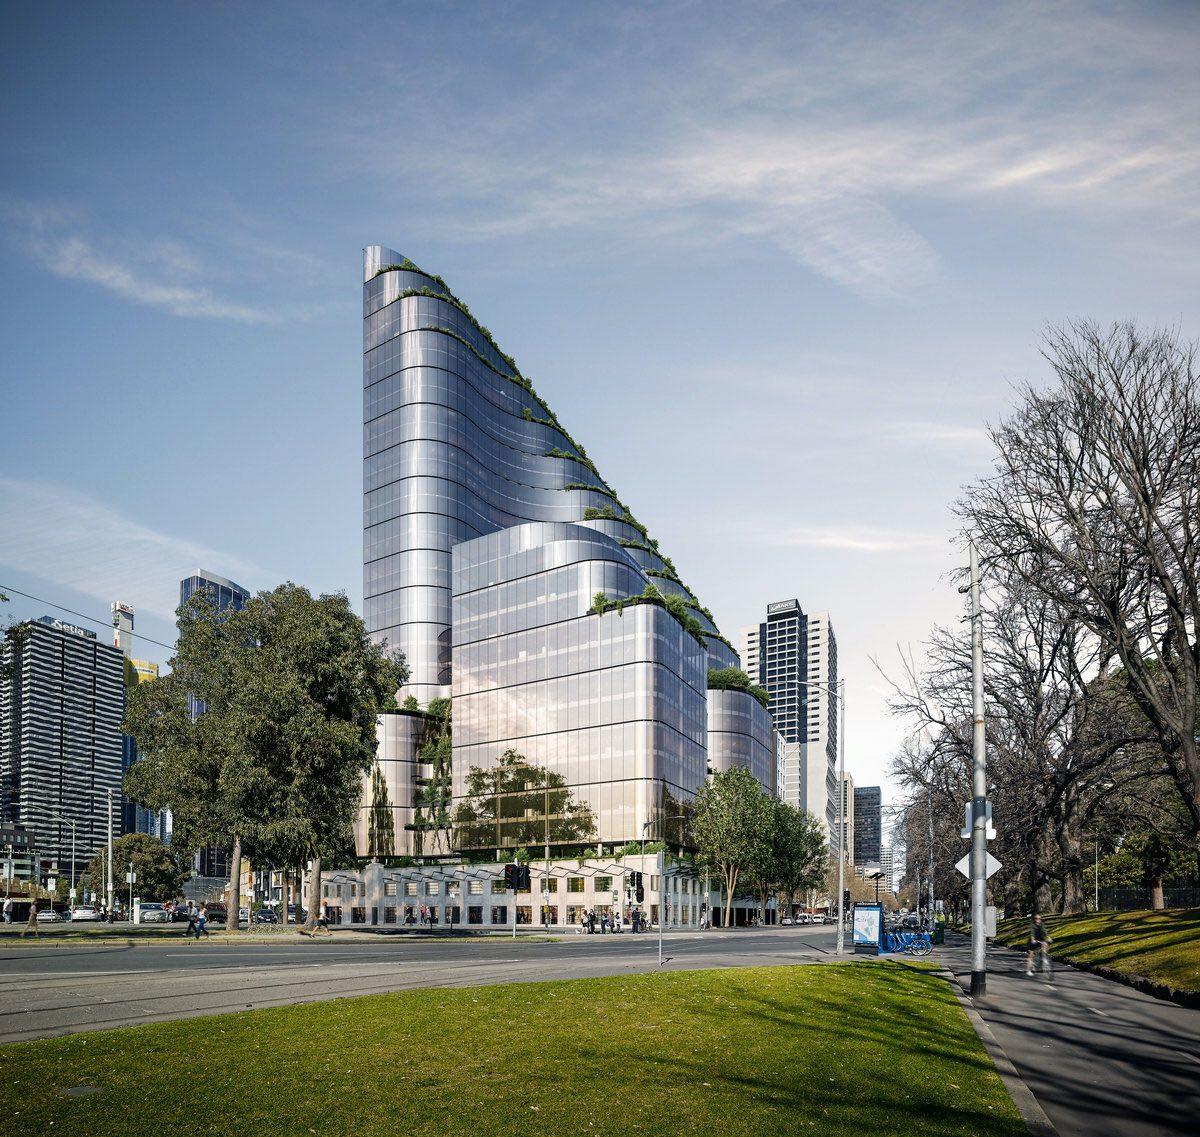 a 5 star hotel located in Melbourne